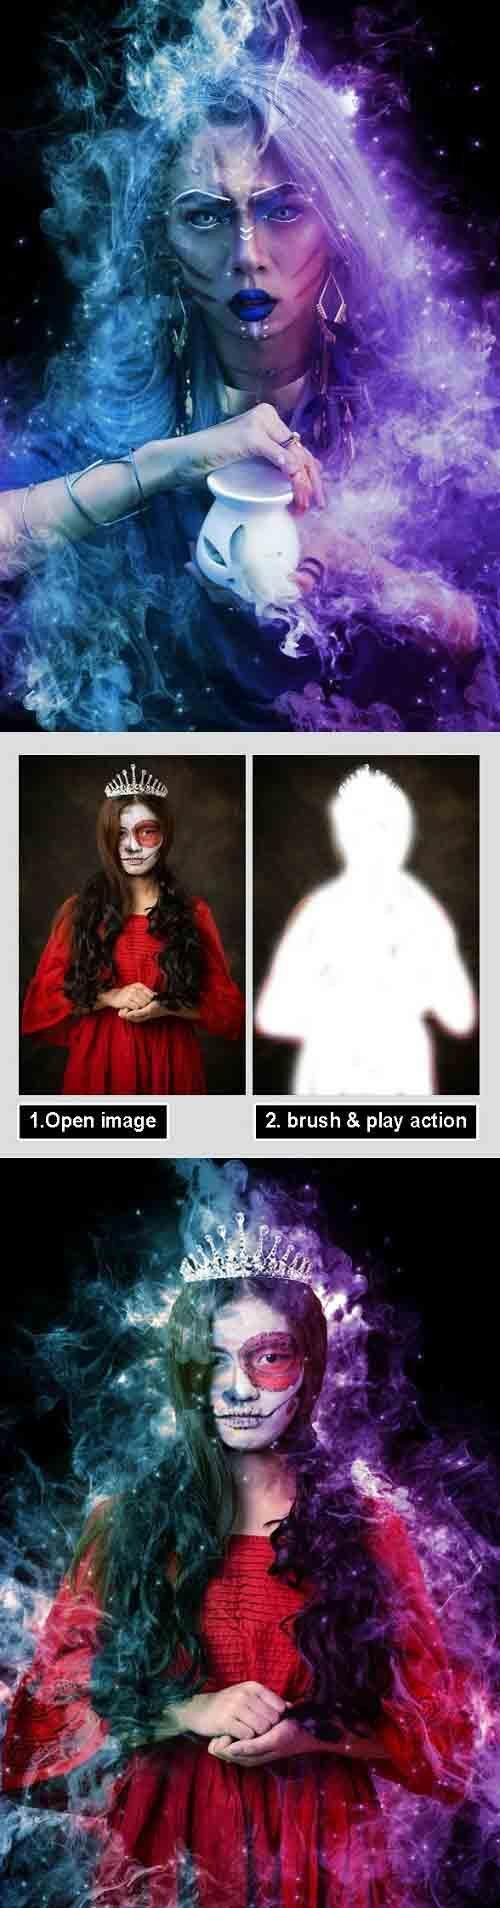 GraphicRiver - Magic Dust Photoshop Action 31098398